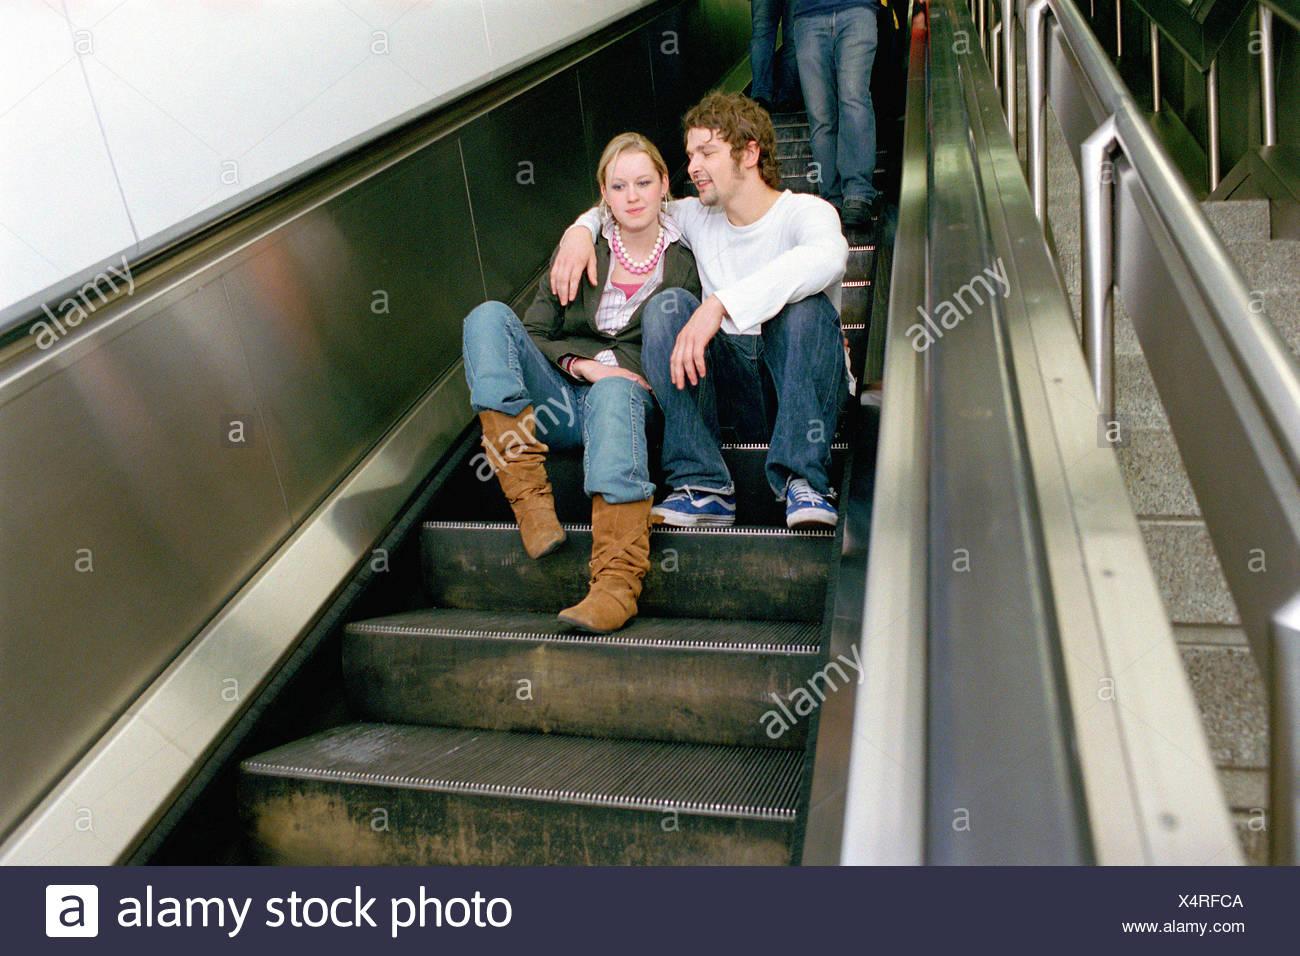 Couple sitting on escalator Stock Photo